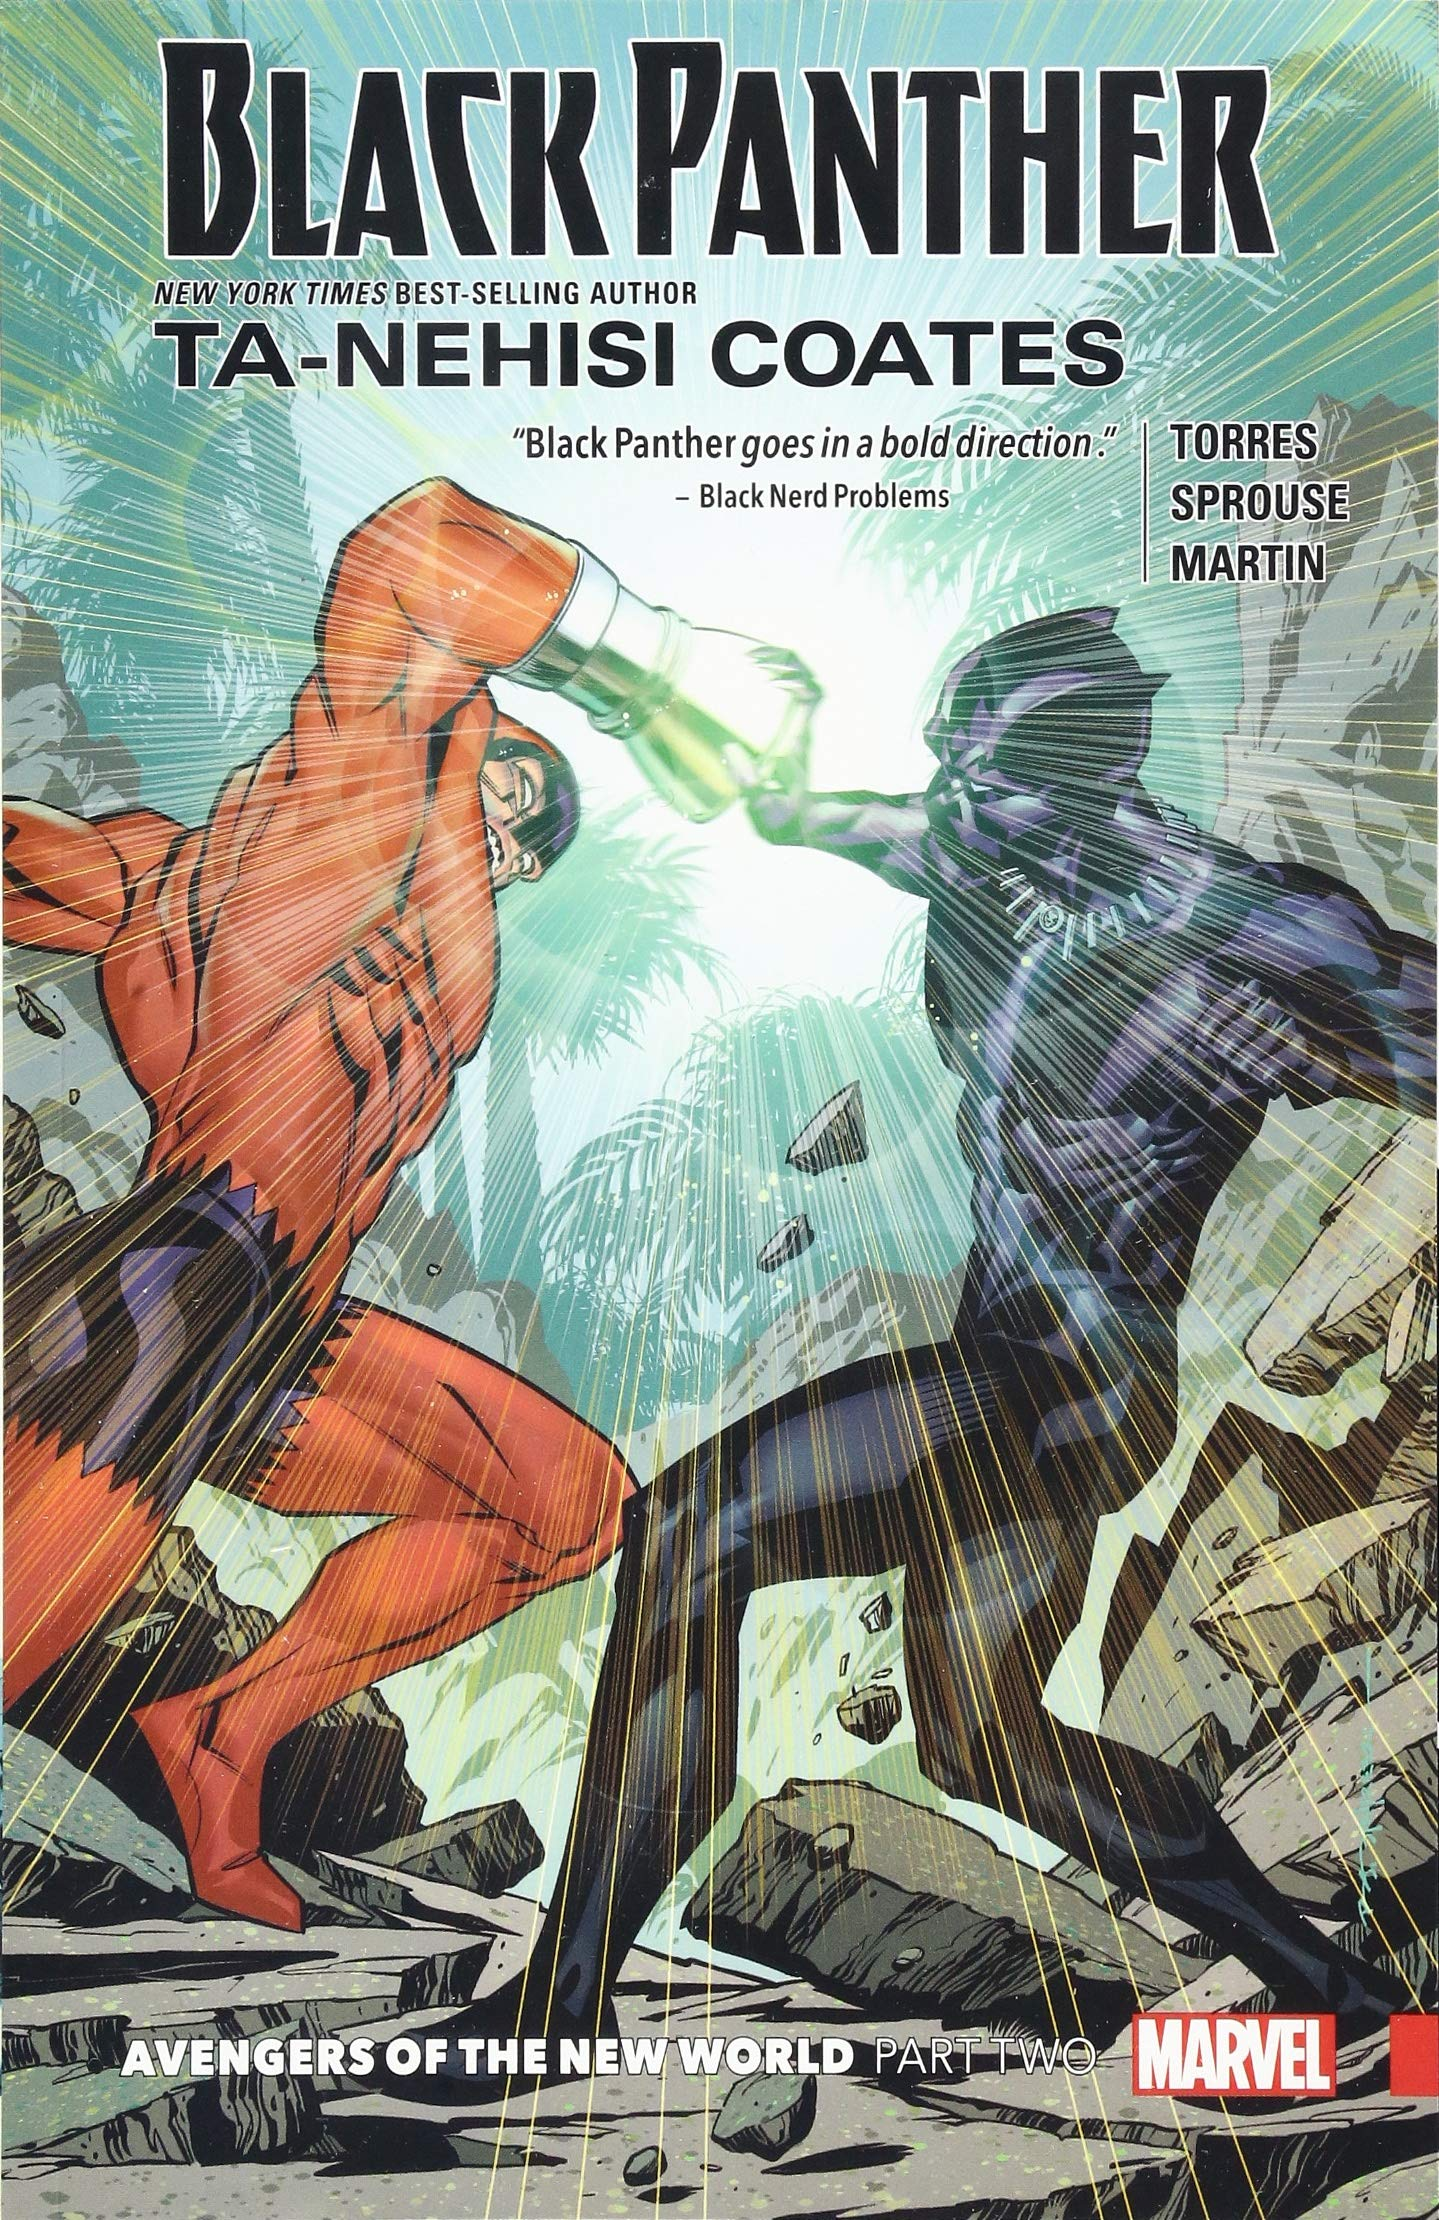 Amazon Com Black Panther Book 5 Avengers Of The New World Part 2 9781302909888 Coates Ta Nehisi Kirk Leonard Sprouse Chris Books